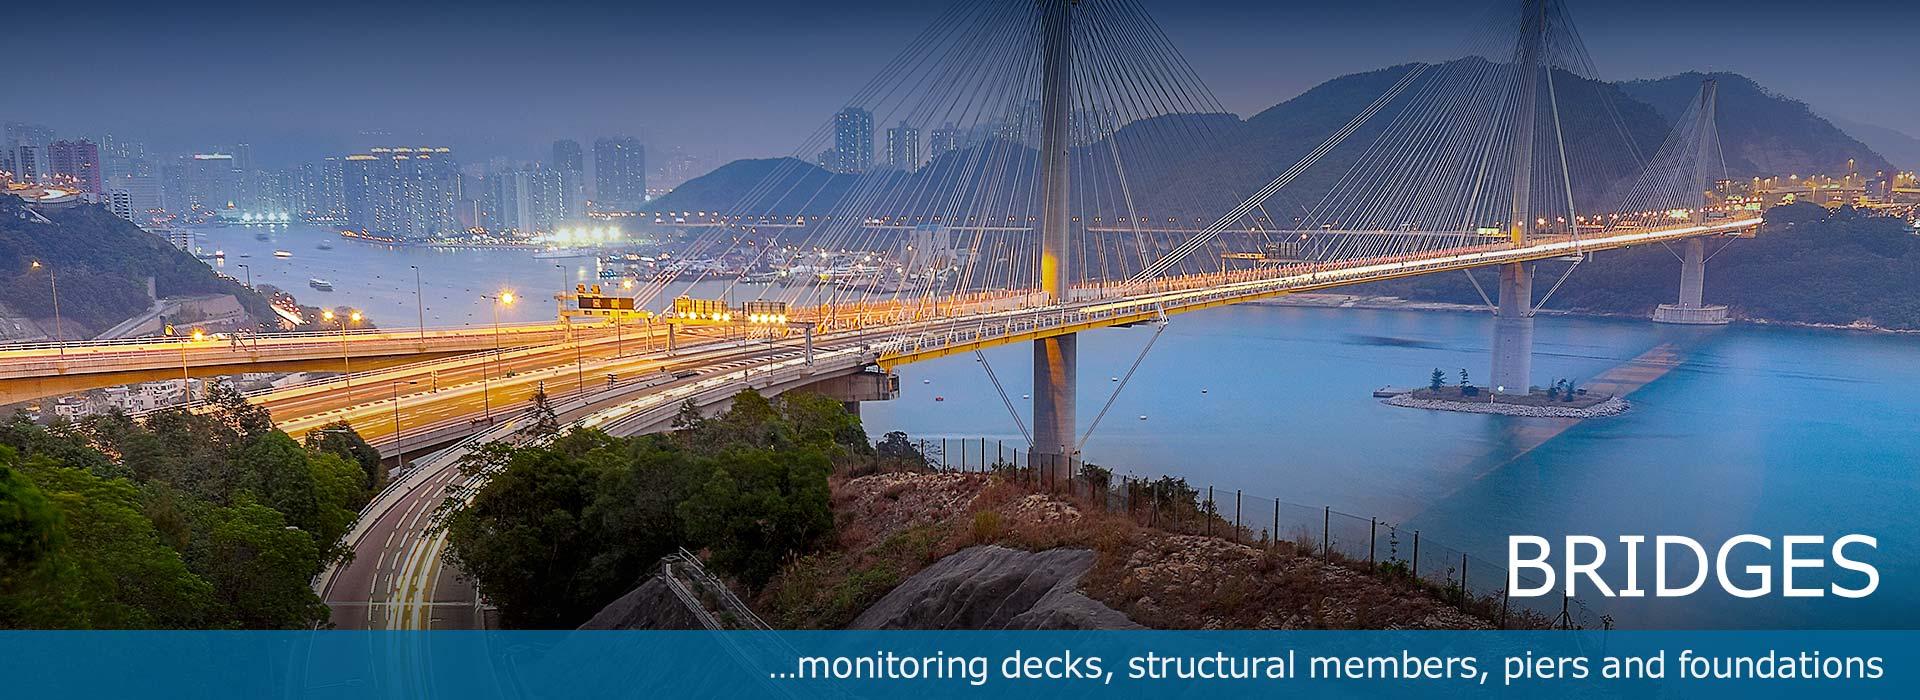 Geotechnical Instruments for Bridges